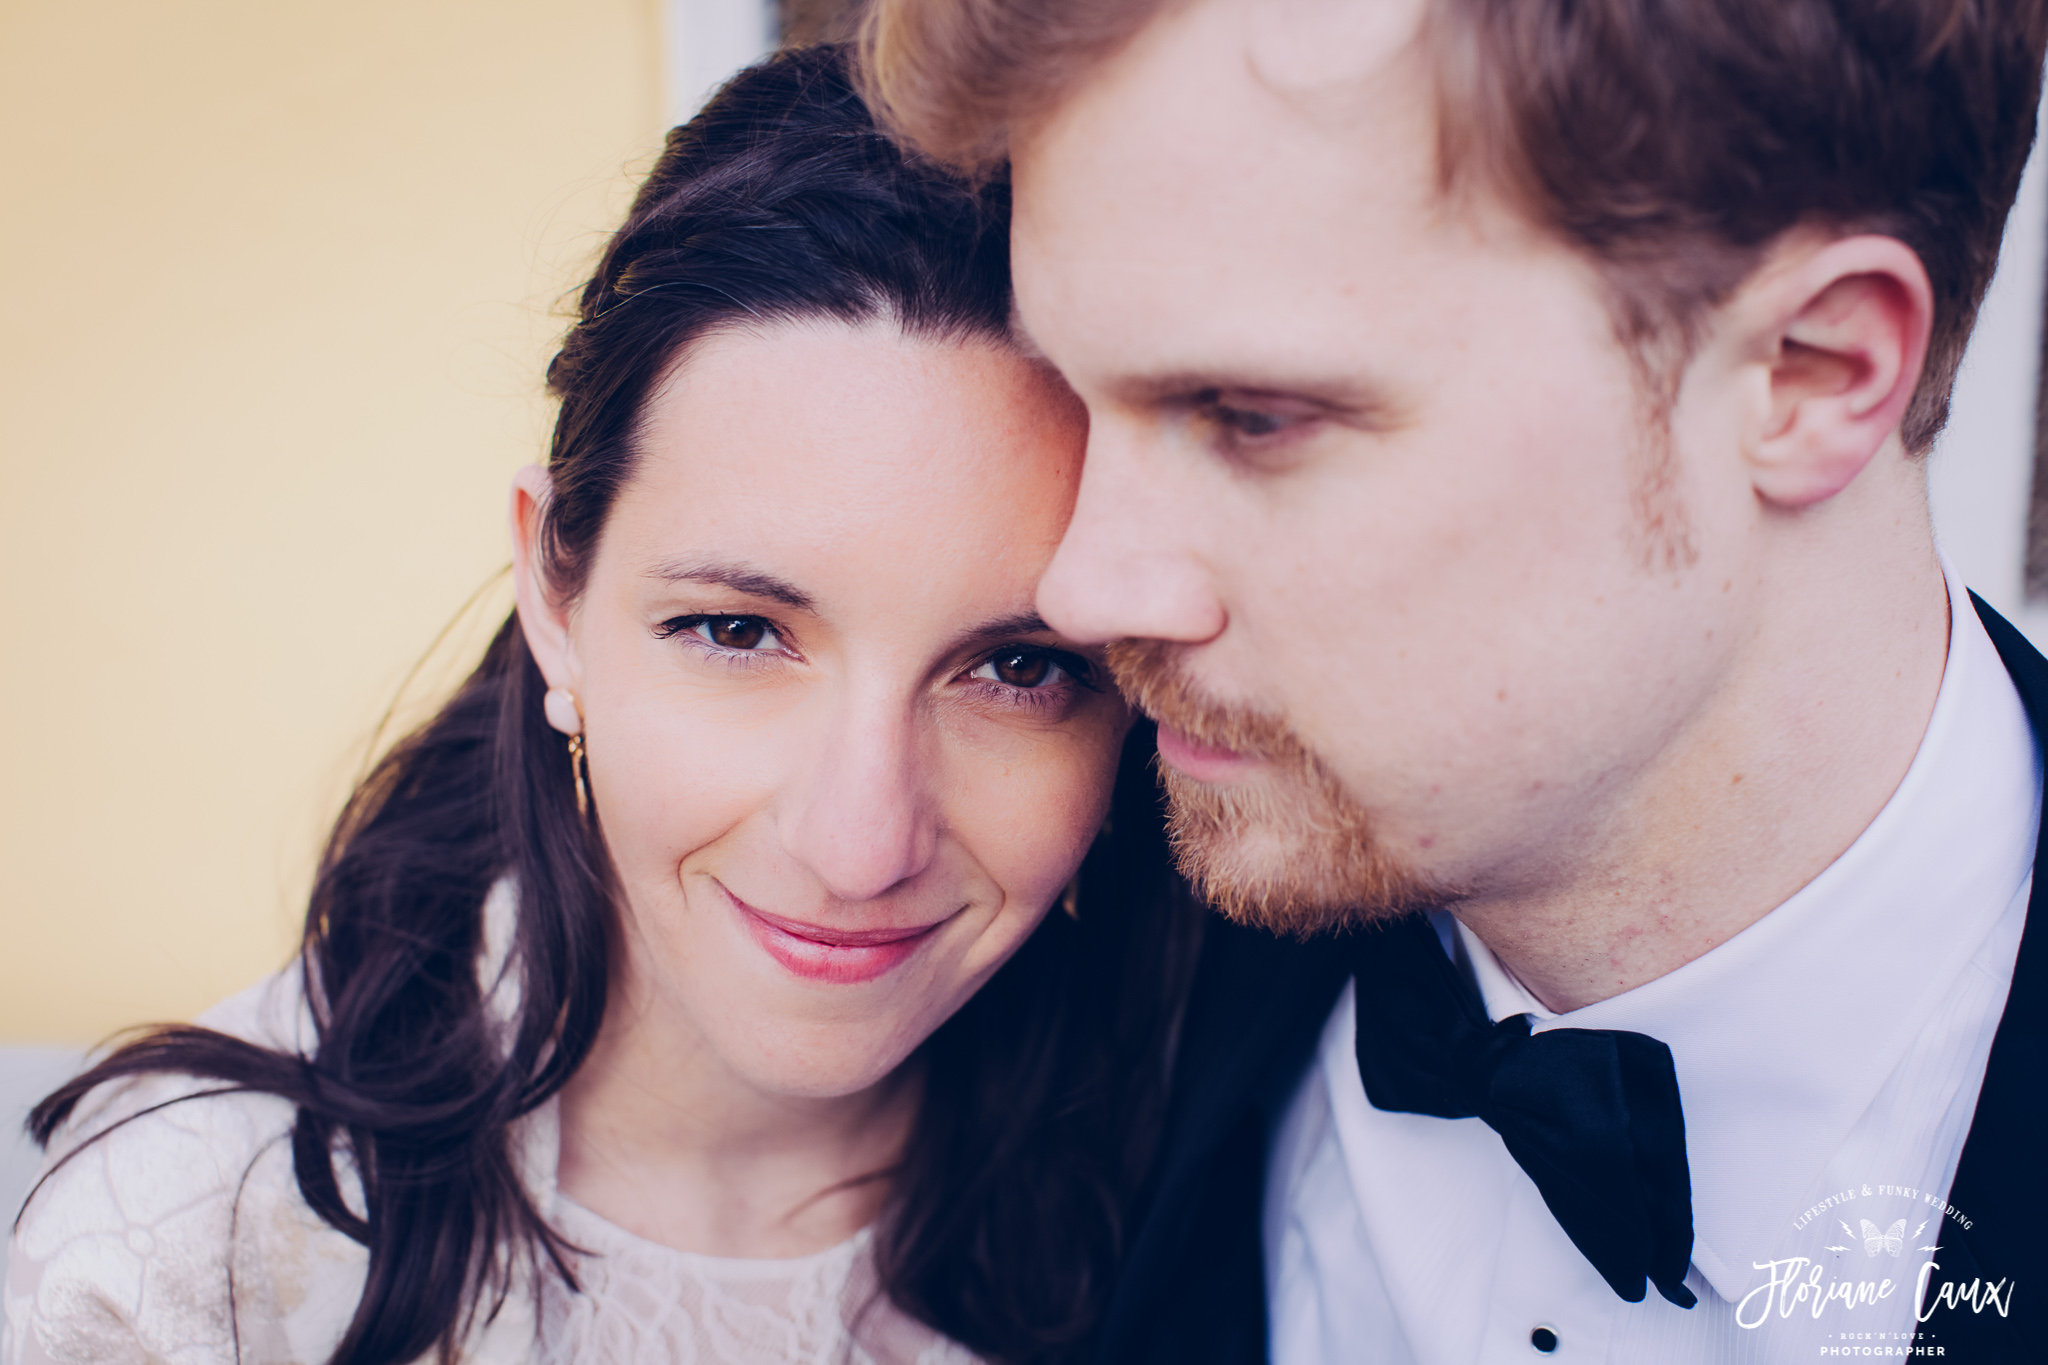 destination-wedding-photographer-oslo-norway-floriane-caux-16